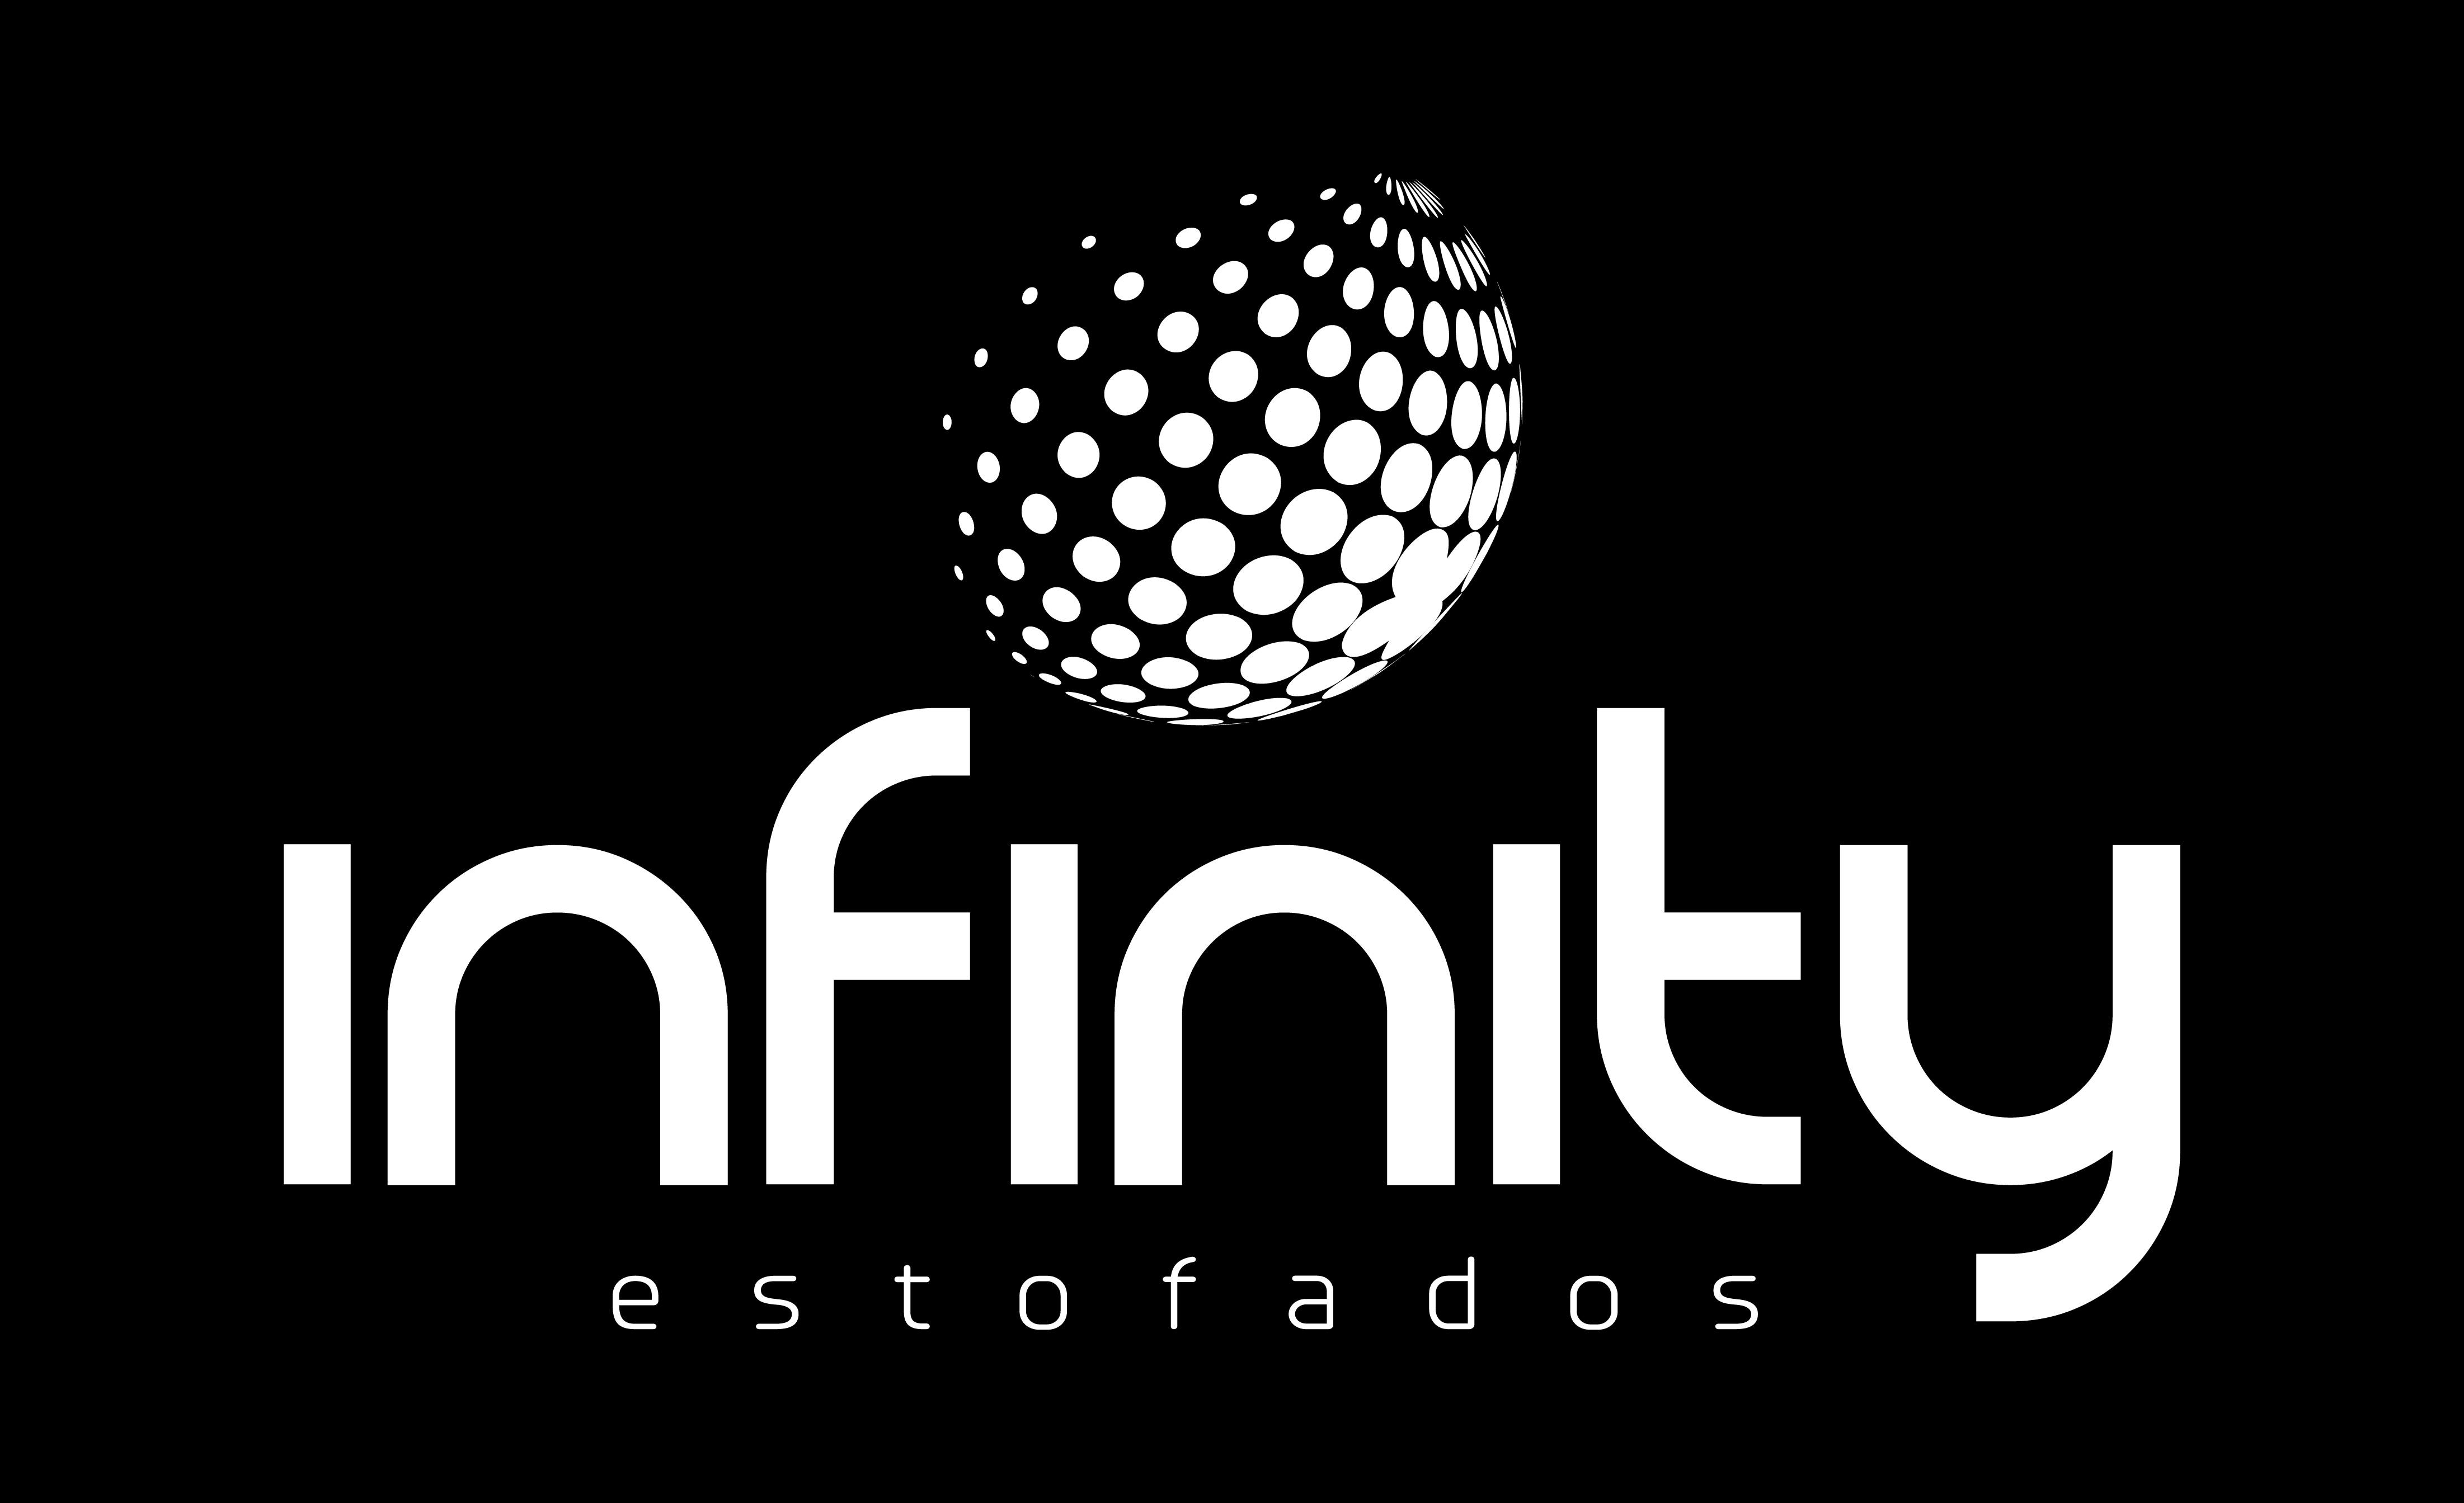 INFINITY ESTOFADOS E DECORACOES